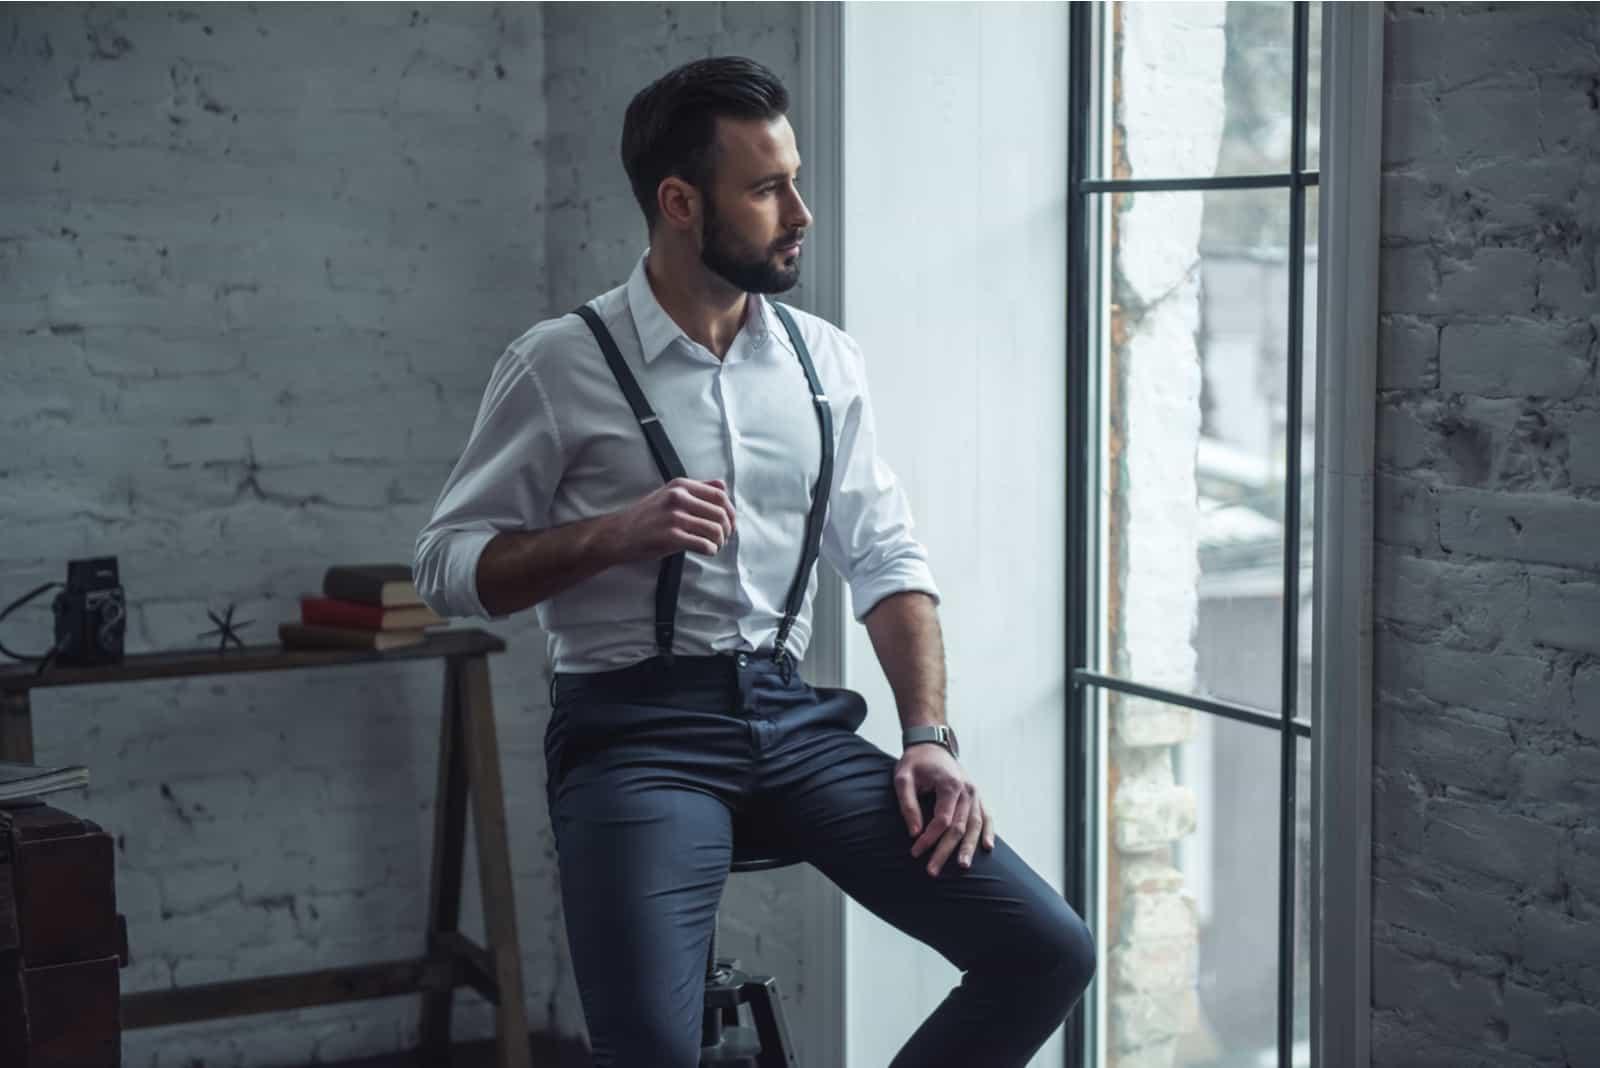 Bel homme élégant en costume